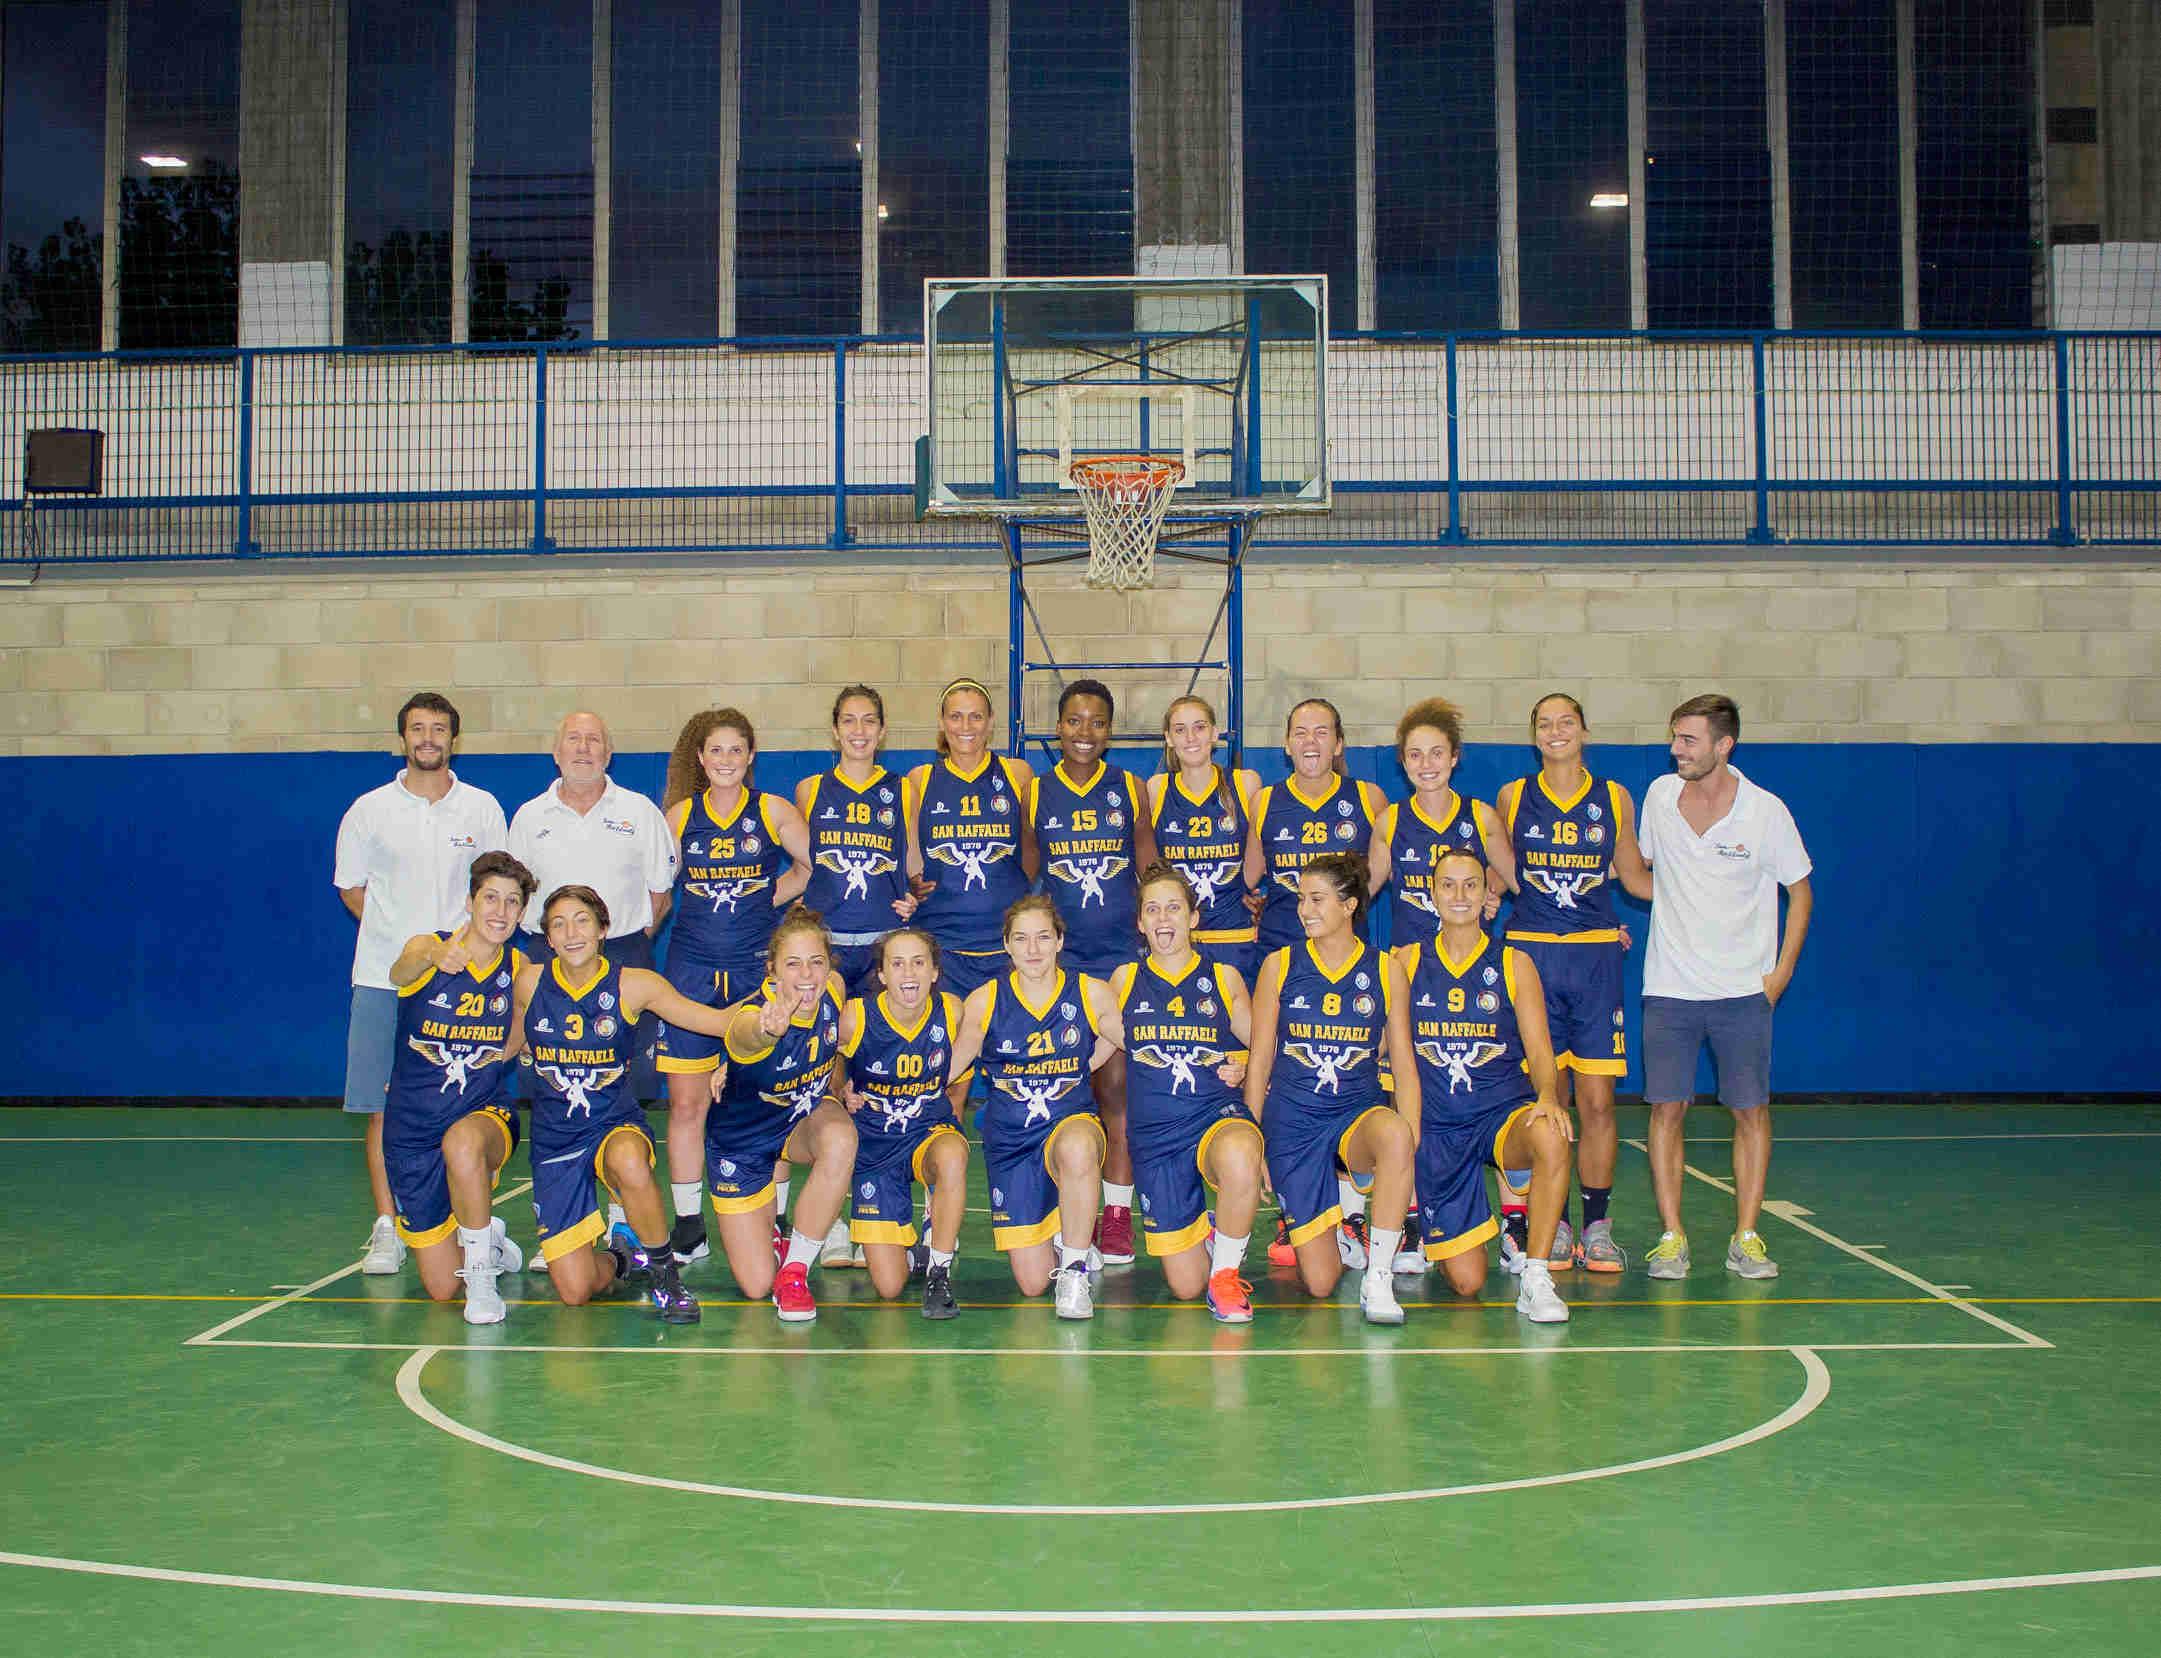 Lega A2 Femminile Gu2to Cup 2017-18: il San Raffaele Basket attende la capolista Use Empoli Rosa